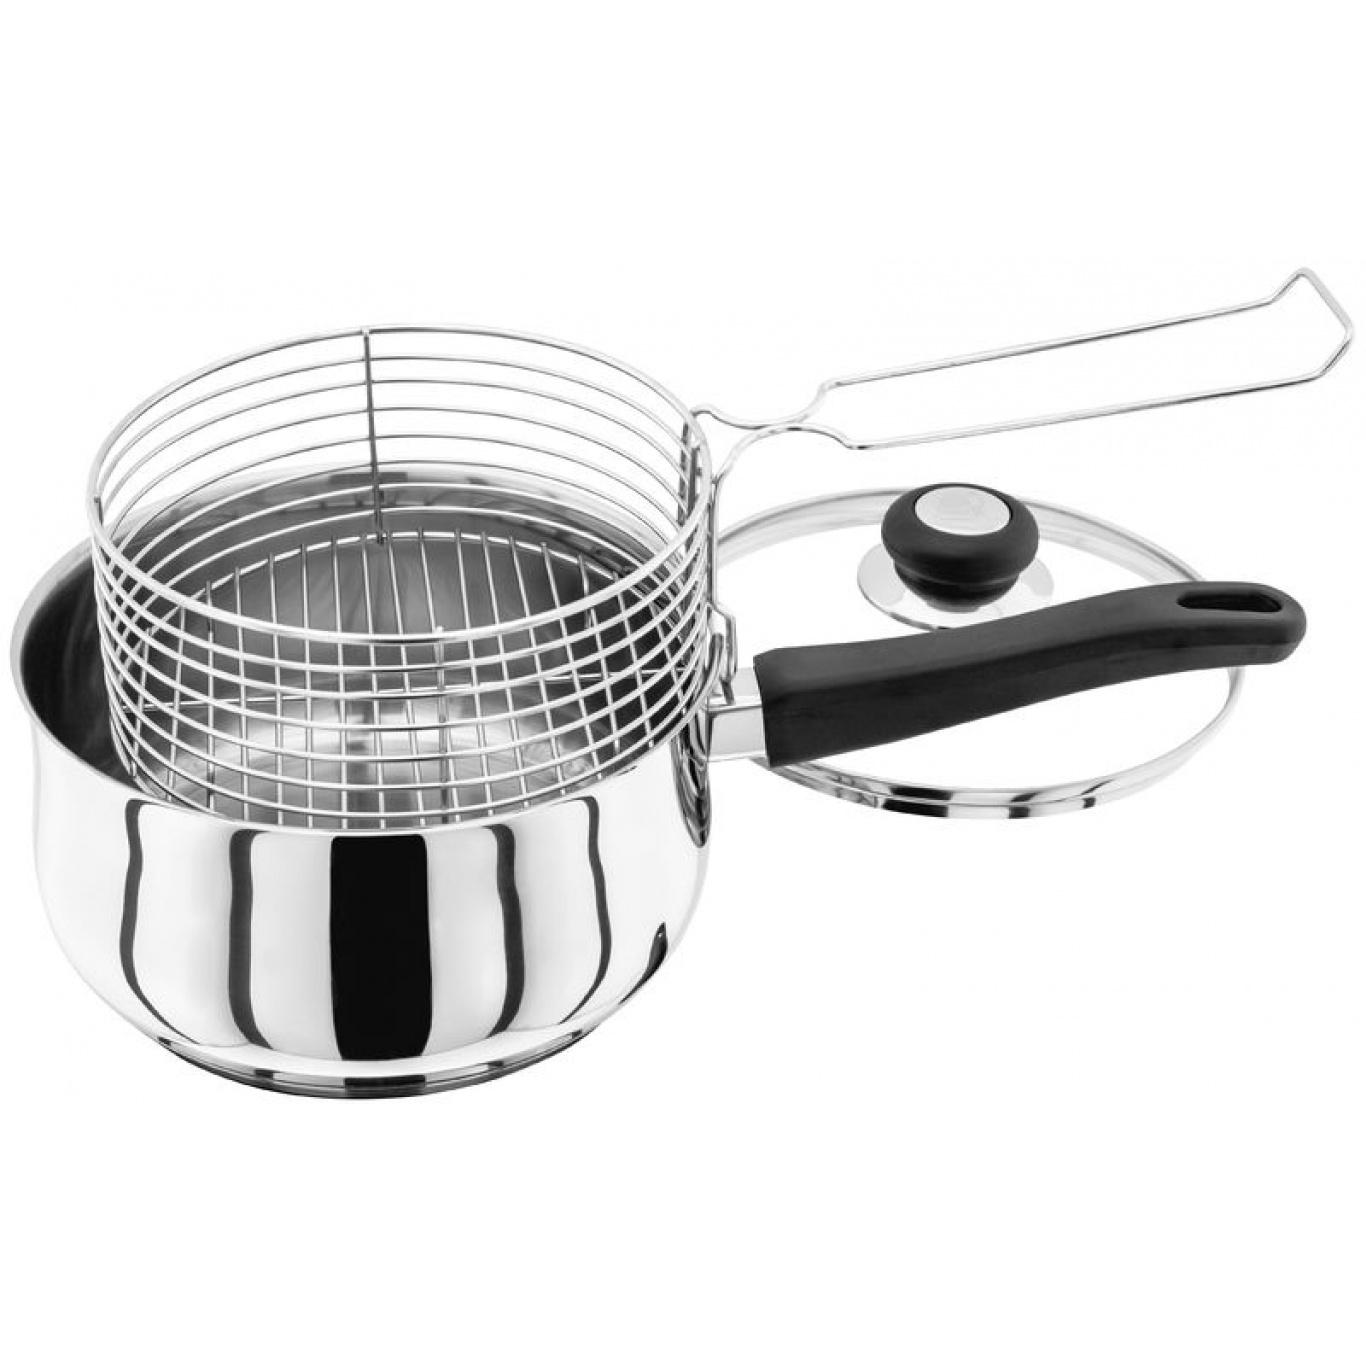 Image of Judge Vista 20cm Chip Pan with Basket